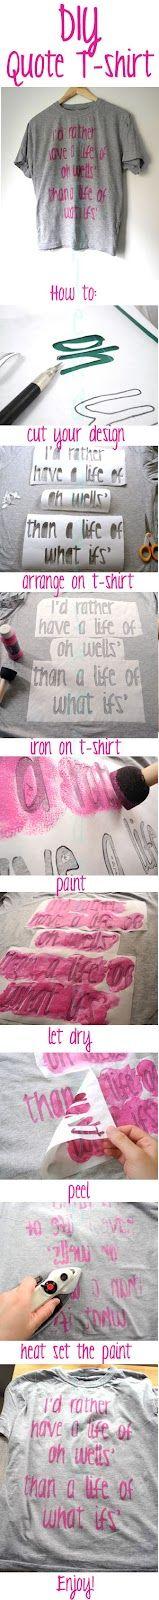 DIY quote shirt